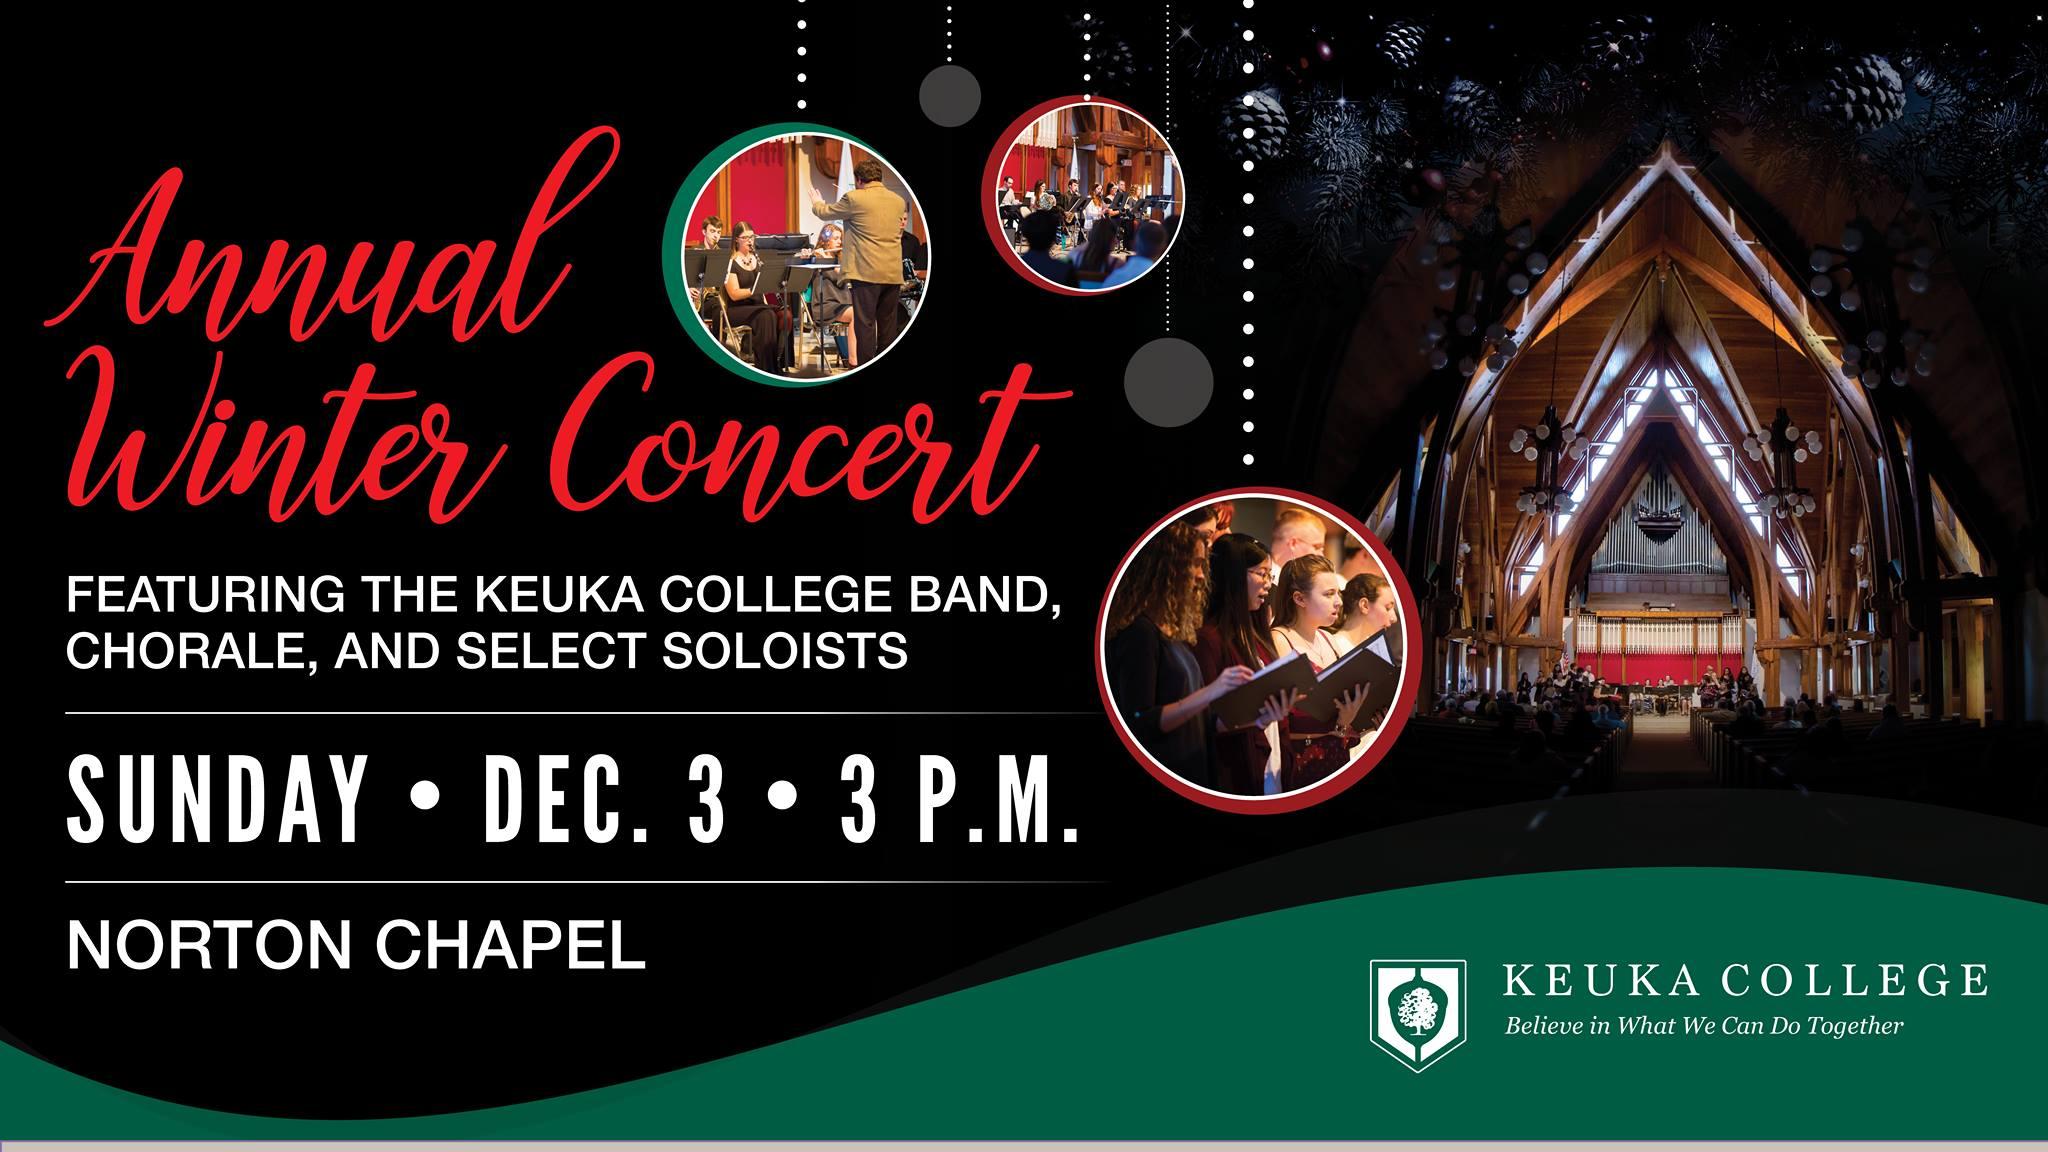 Keuka College Winter Concert Sunday